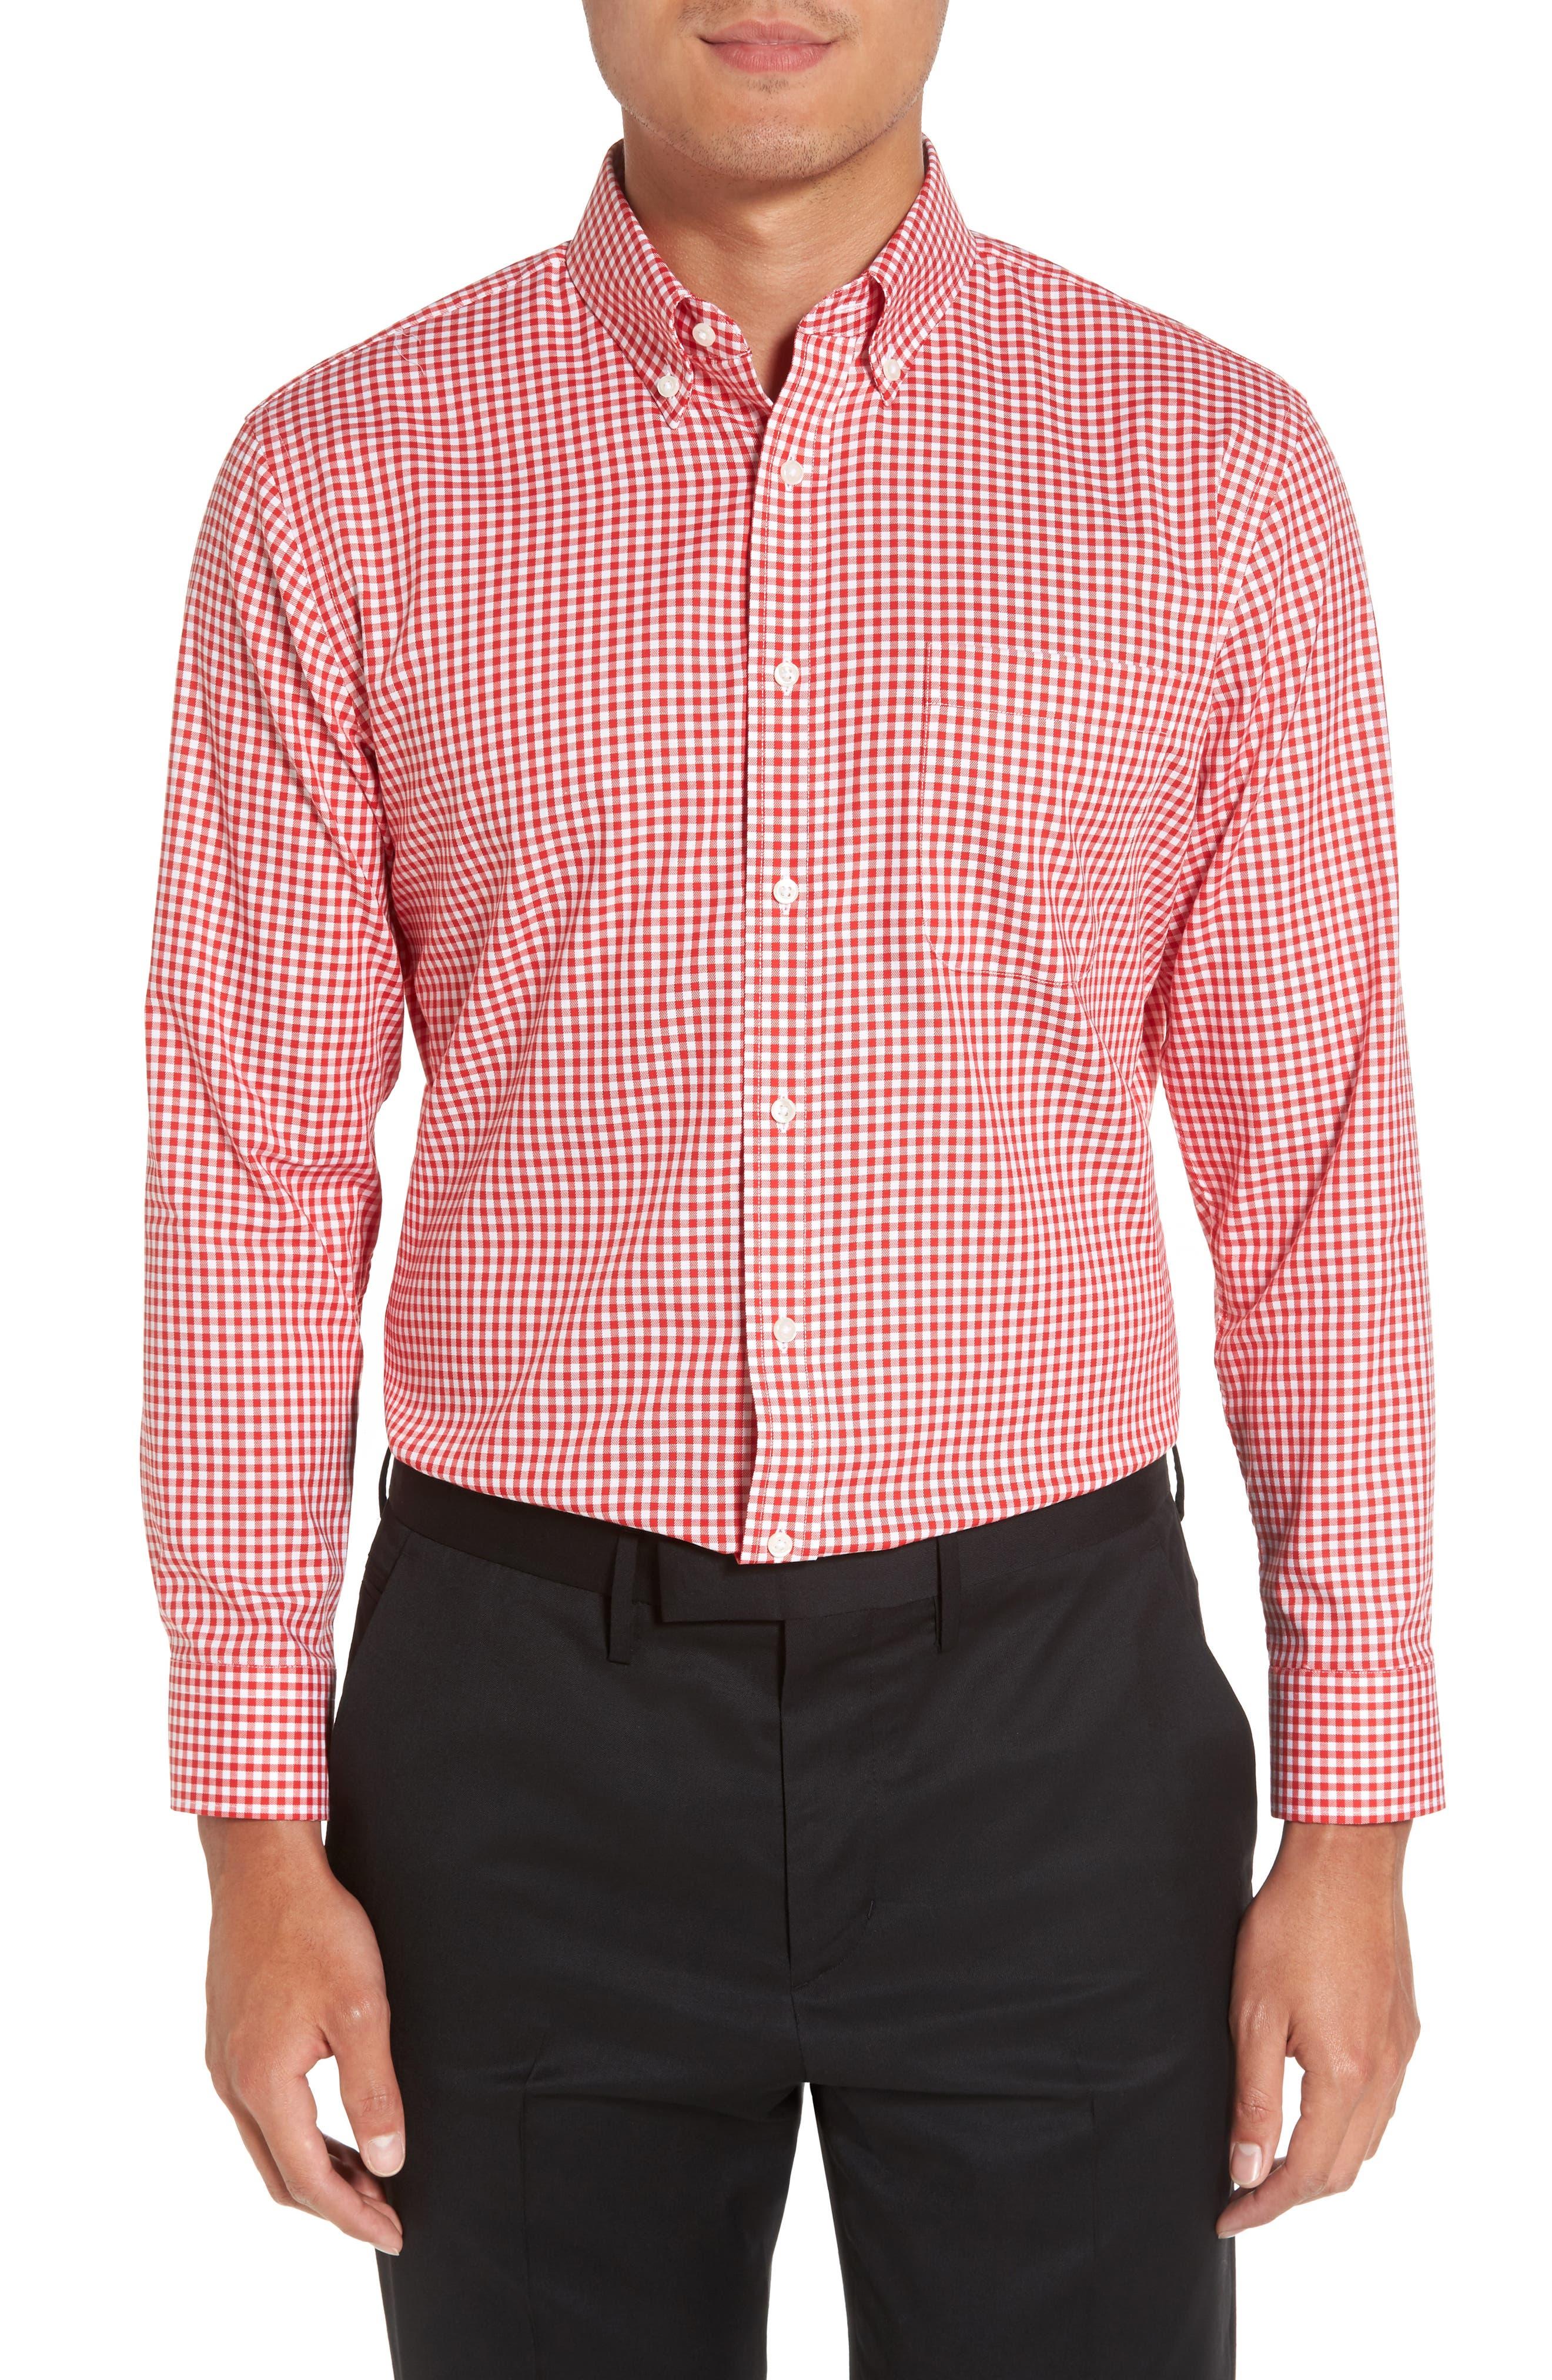 Trim Fit Non-Iron Gingham Dress Shirt,                             Main thumbnail 1, color,                             Red Blaze